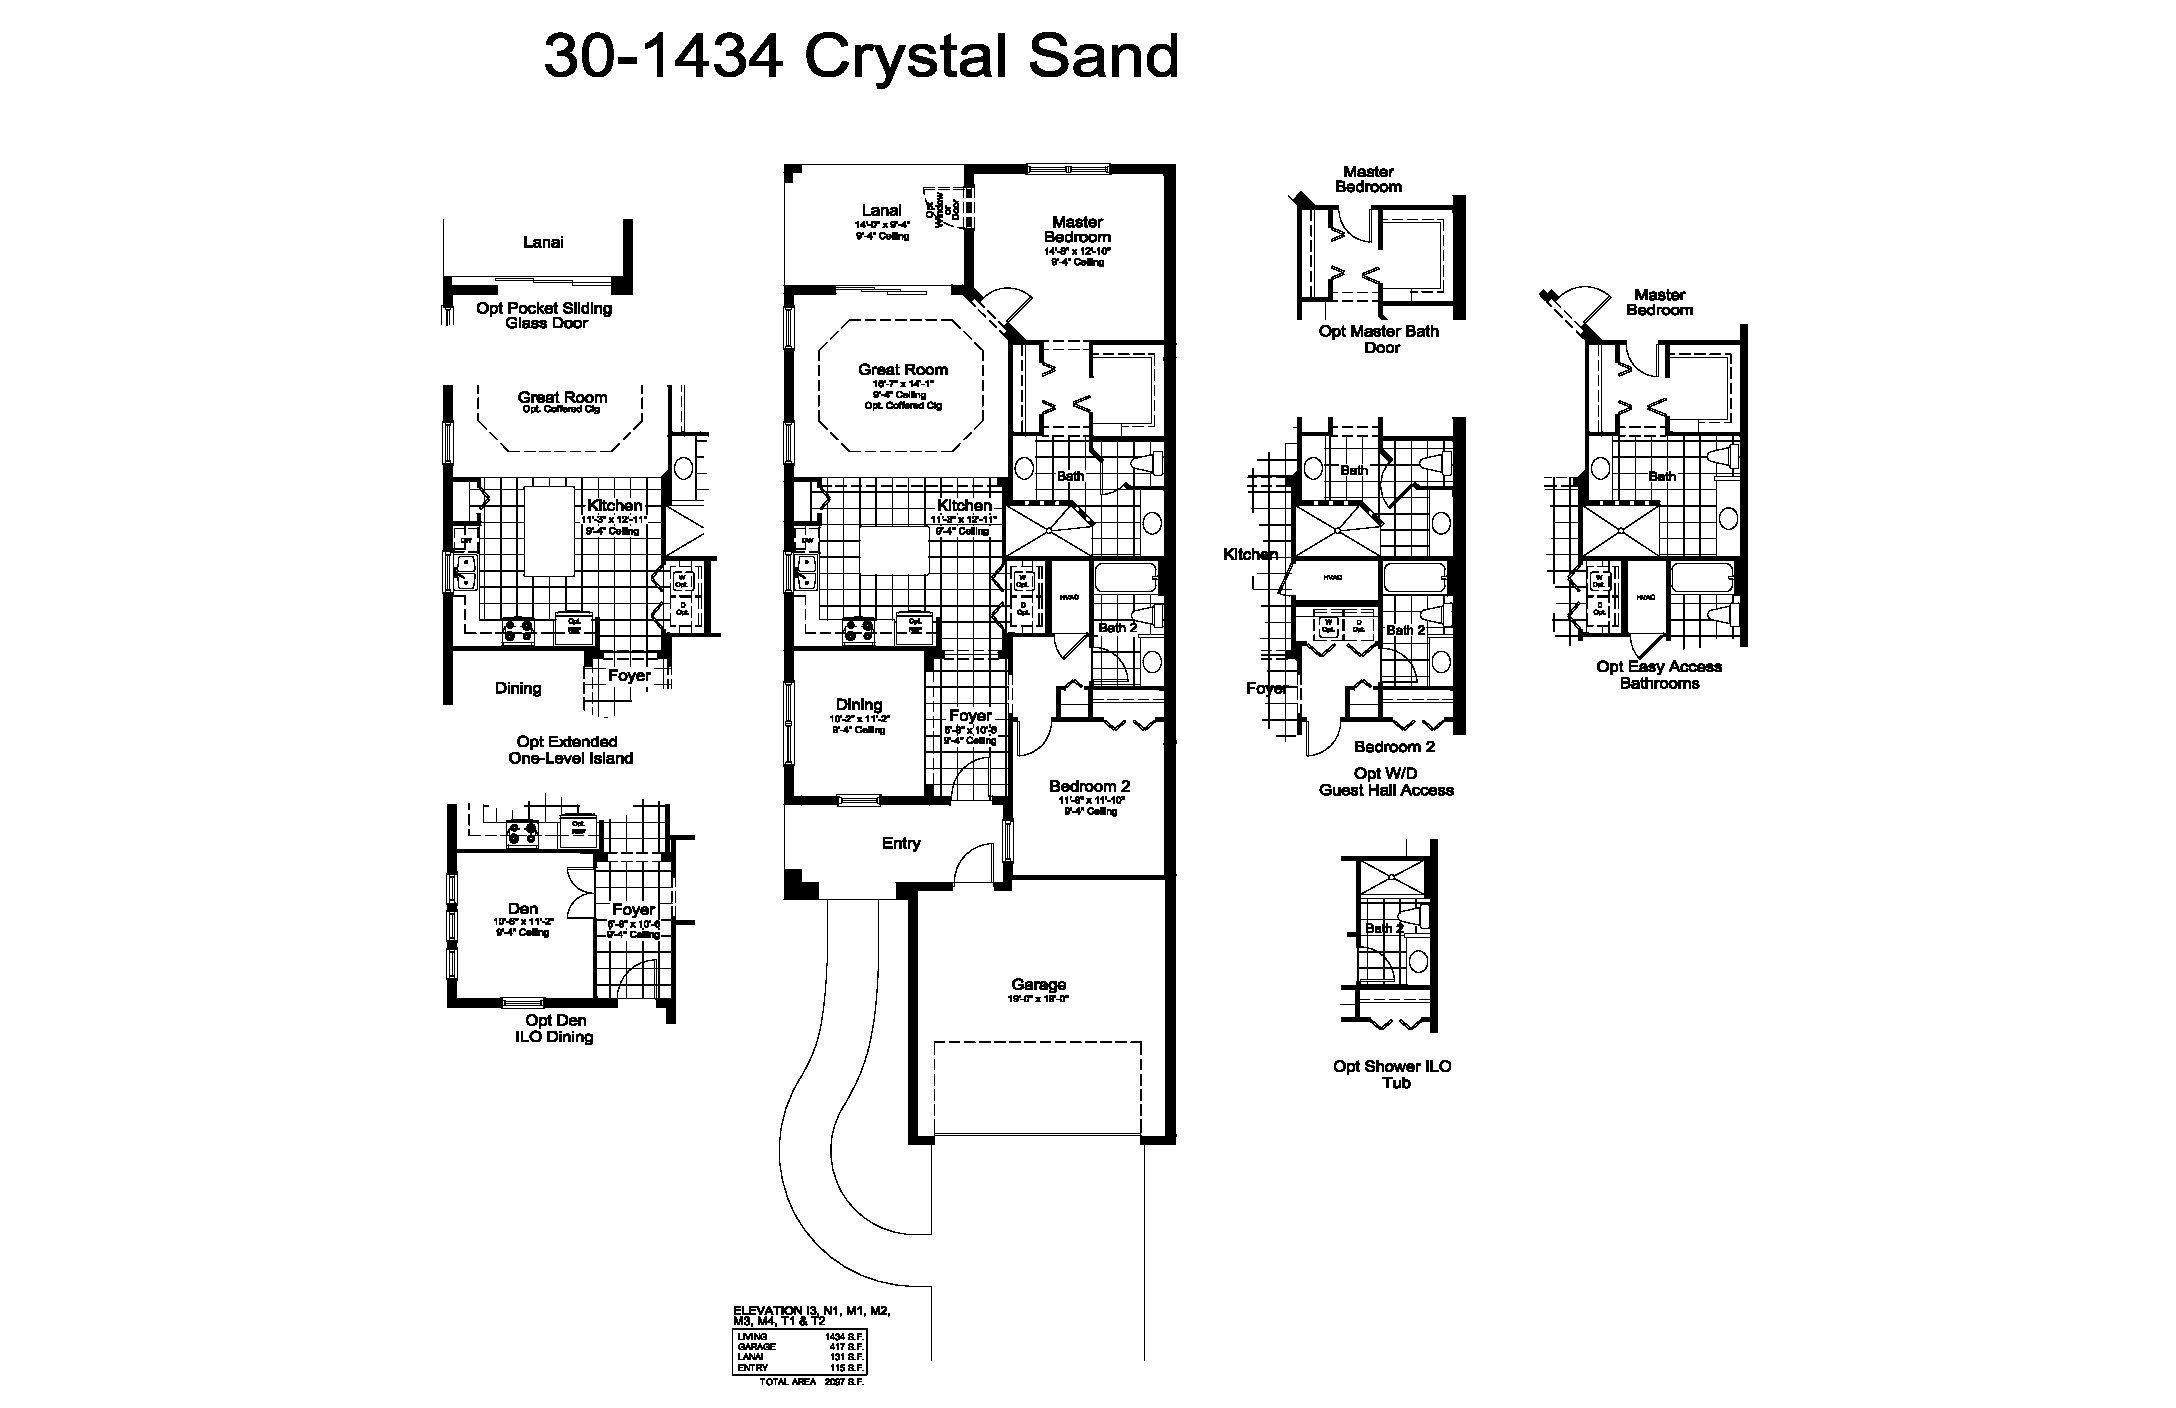 Crystal Sand